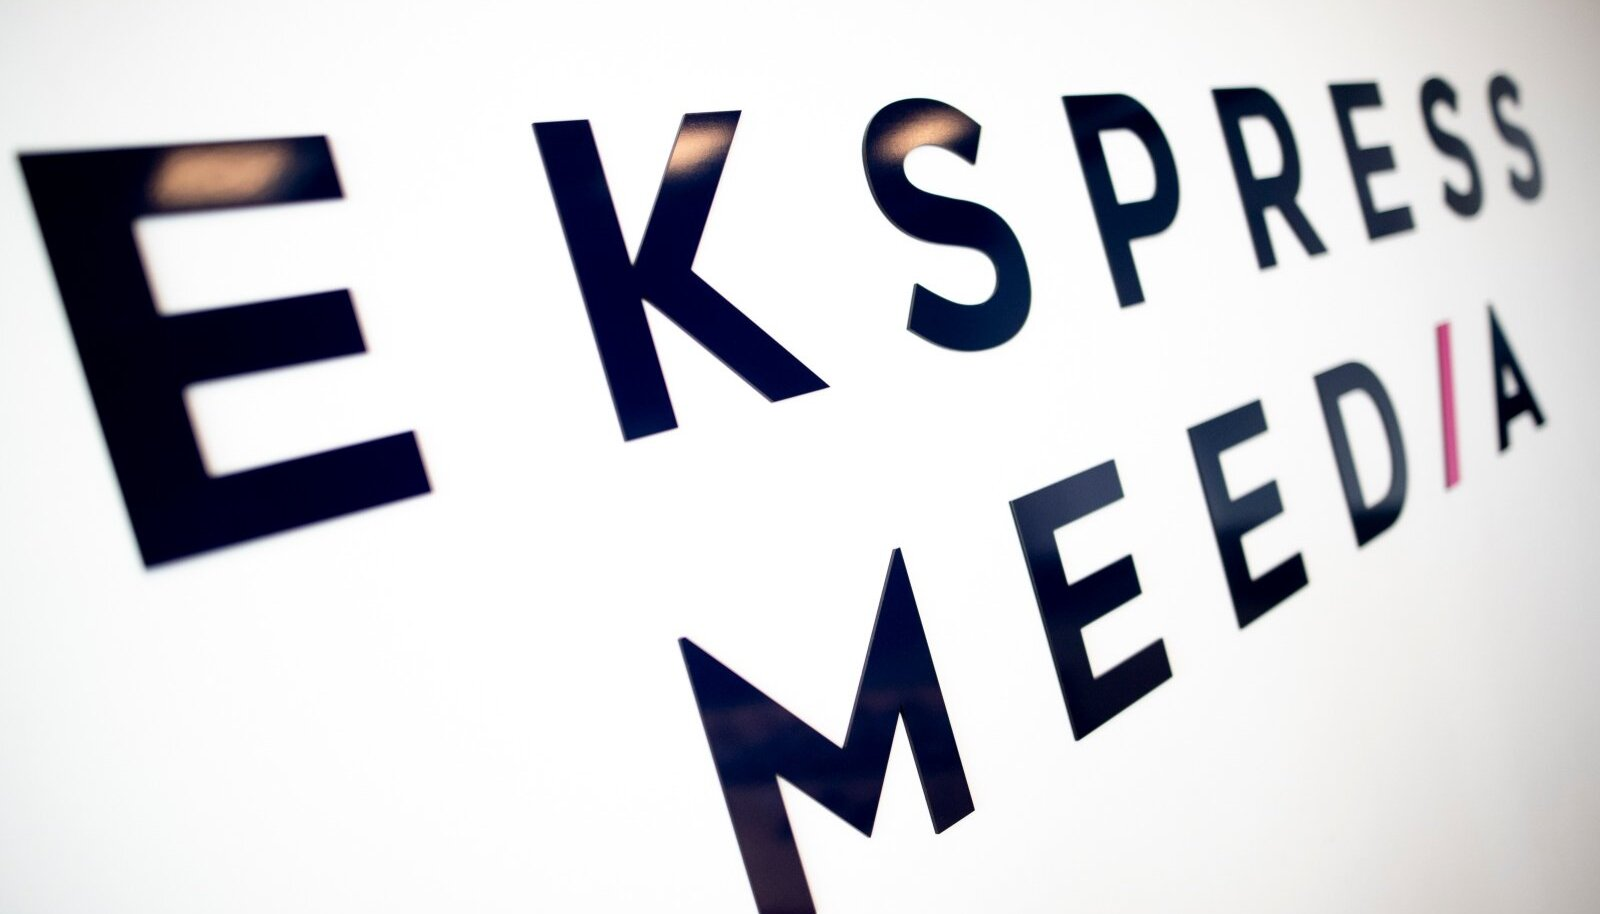 Ekspress Meedia, logo